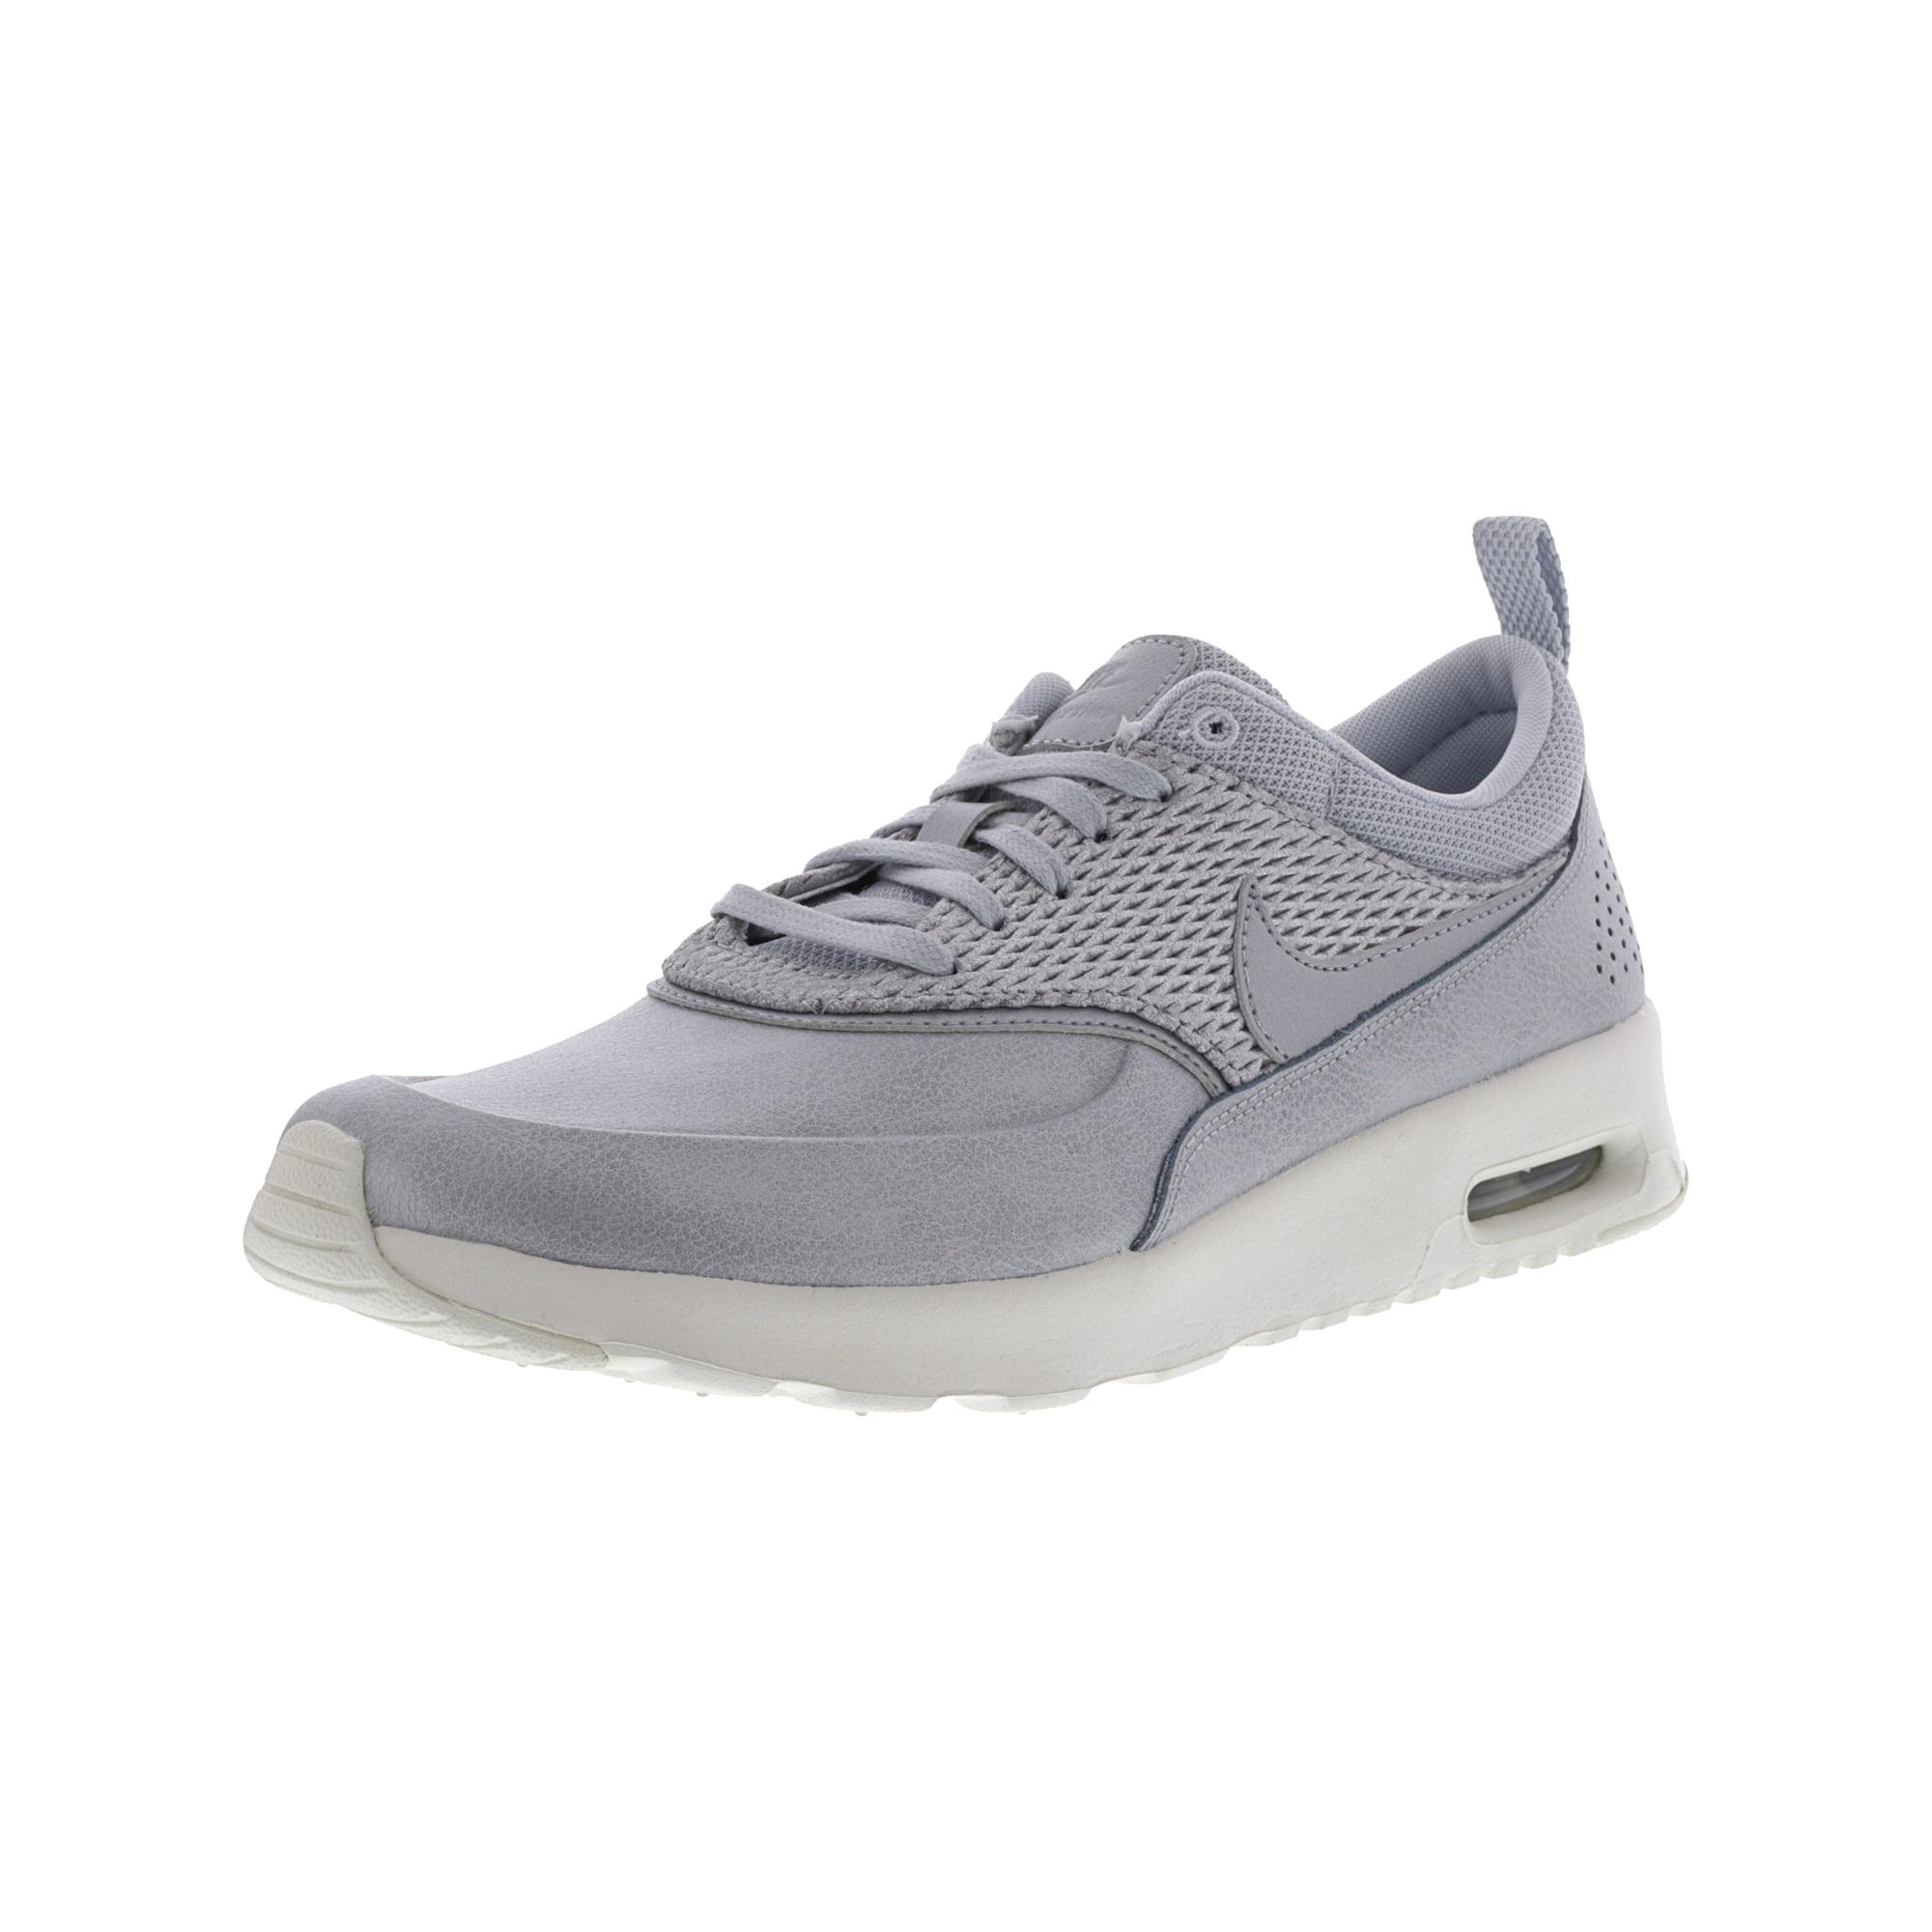 separation shoes 0c688 e5c69 Nike Women s Air Max Thea Prm Leather Metallic Platinum   Pure Ankle-High  Fashion Sneaker - 5.5M   Walmart Canada